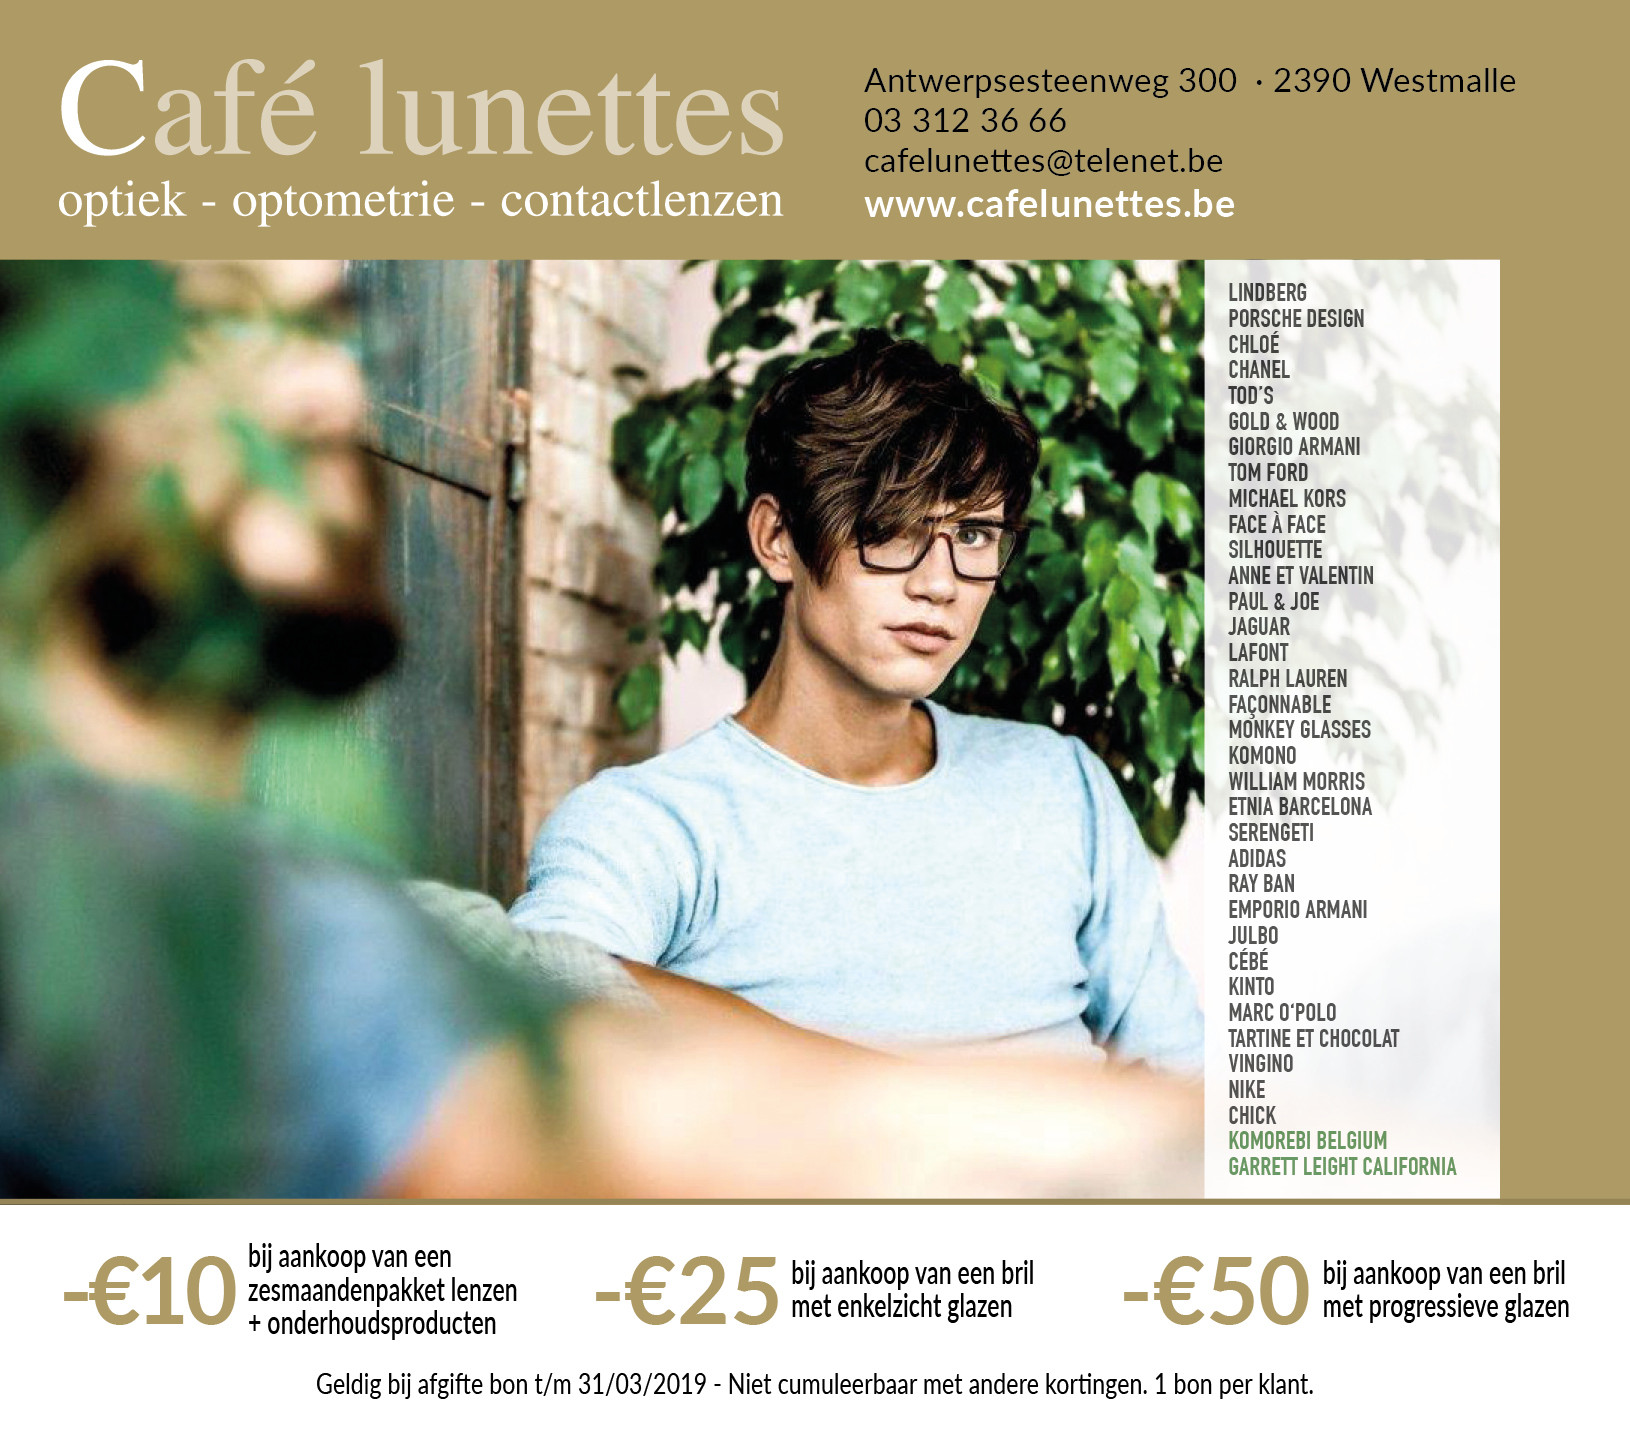 Cafe lunettes